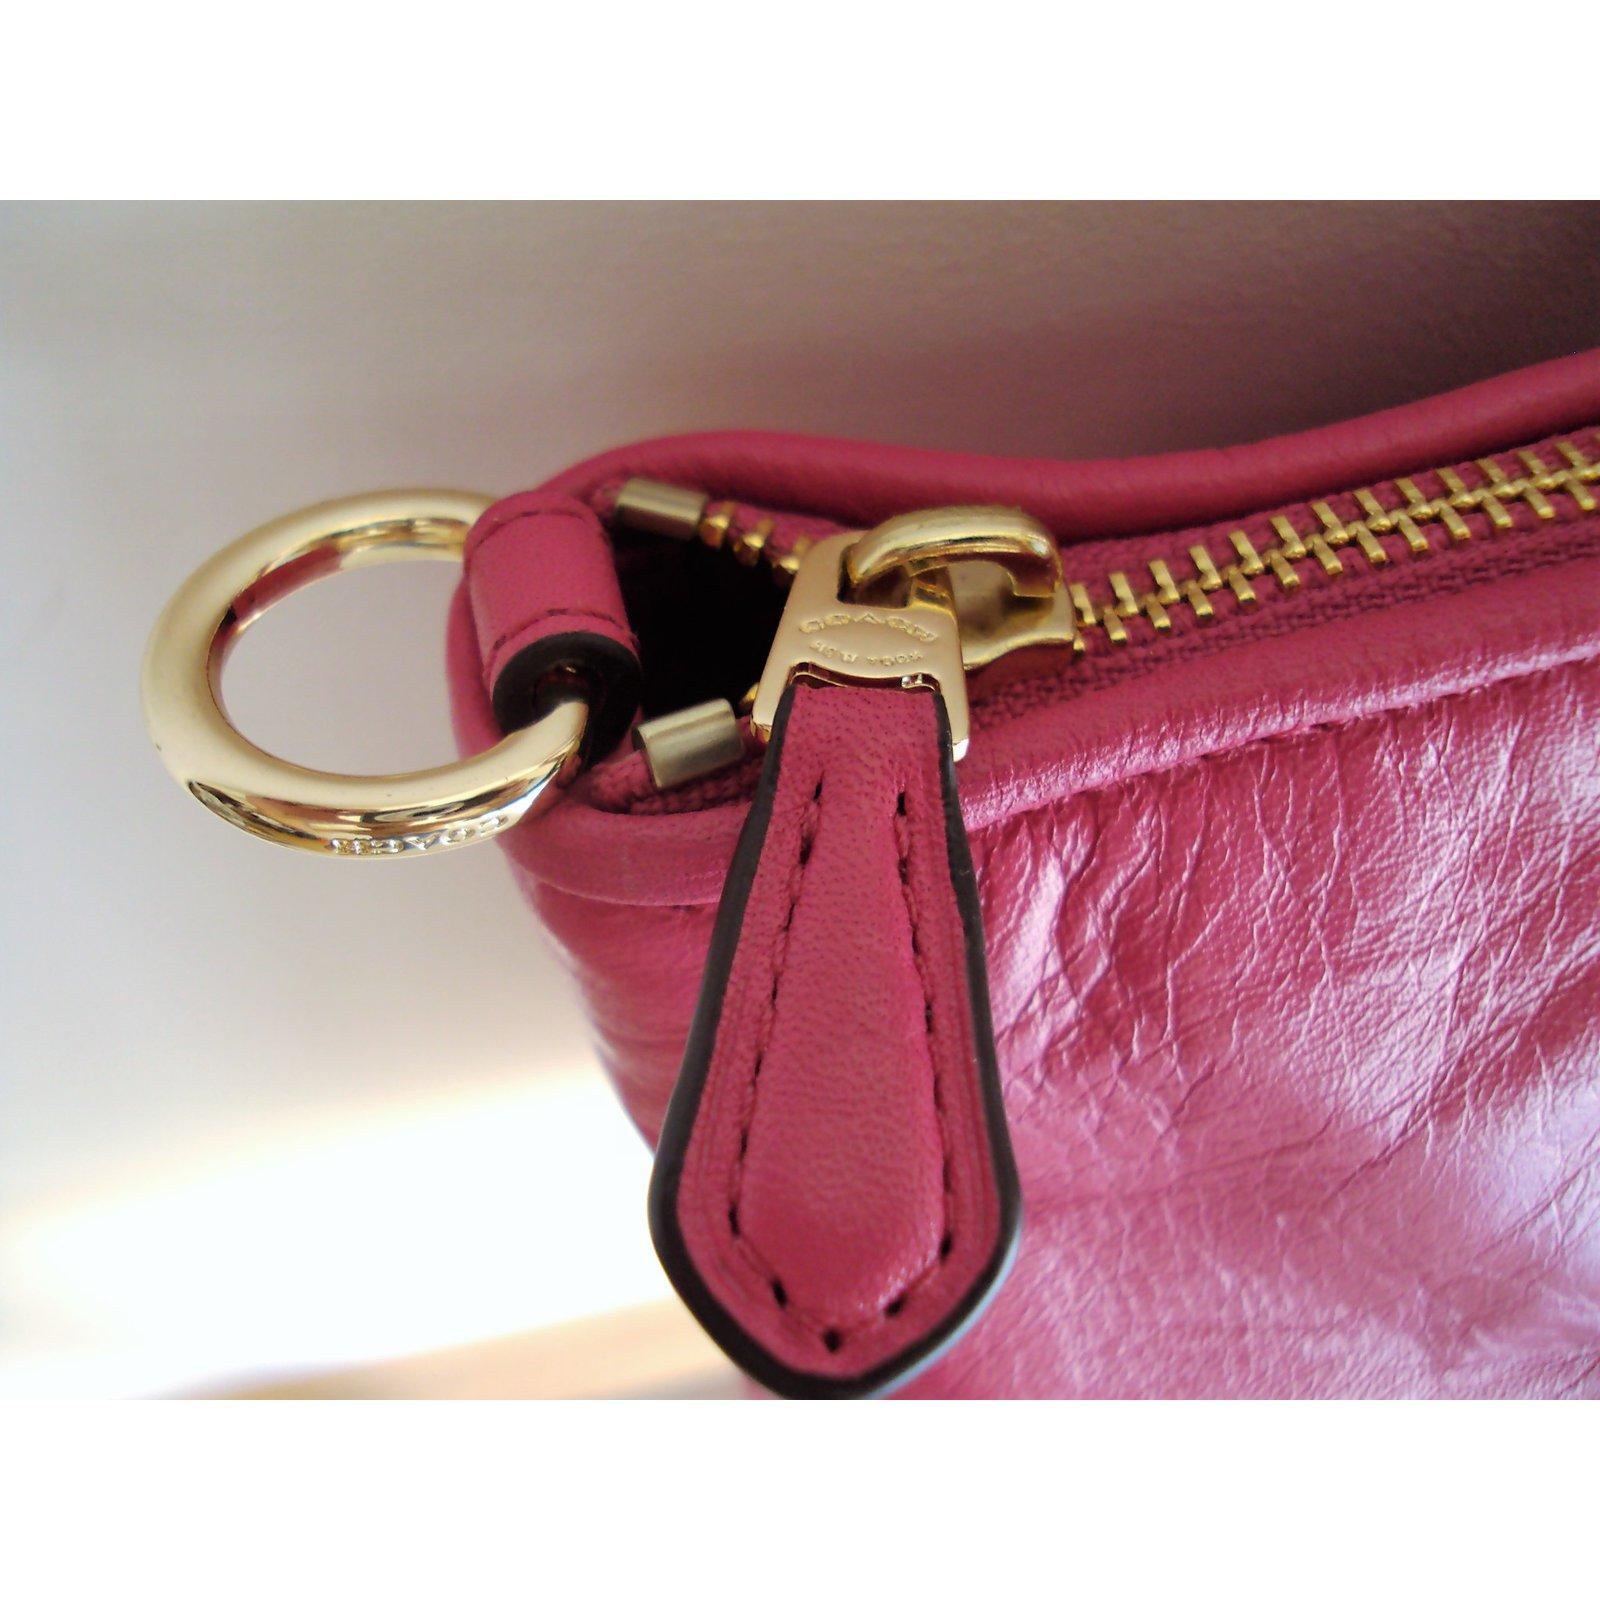 b5cbcb3a9017 Coach Coach - twisted kelsey bag Handbags Leather Pink ref.52158 - Joli  Closet